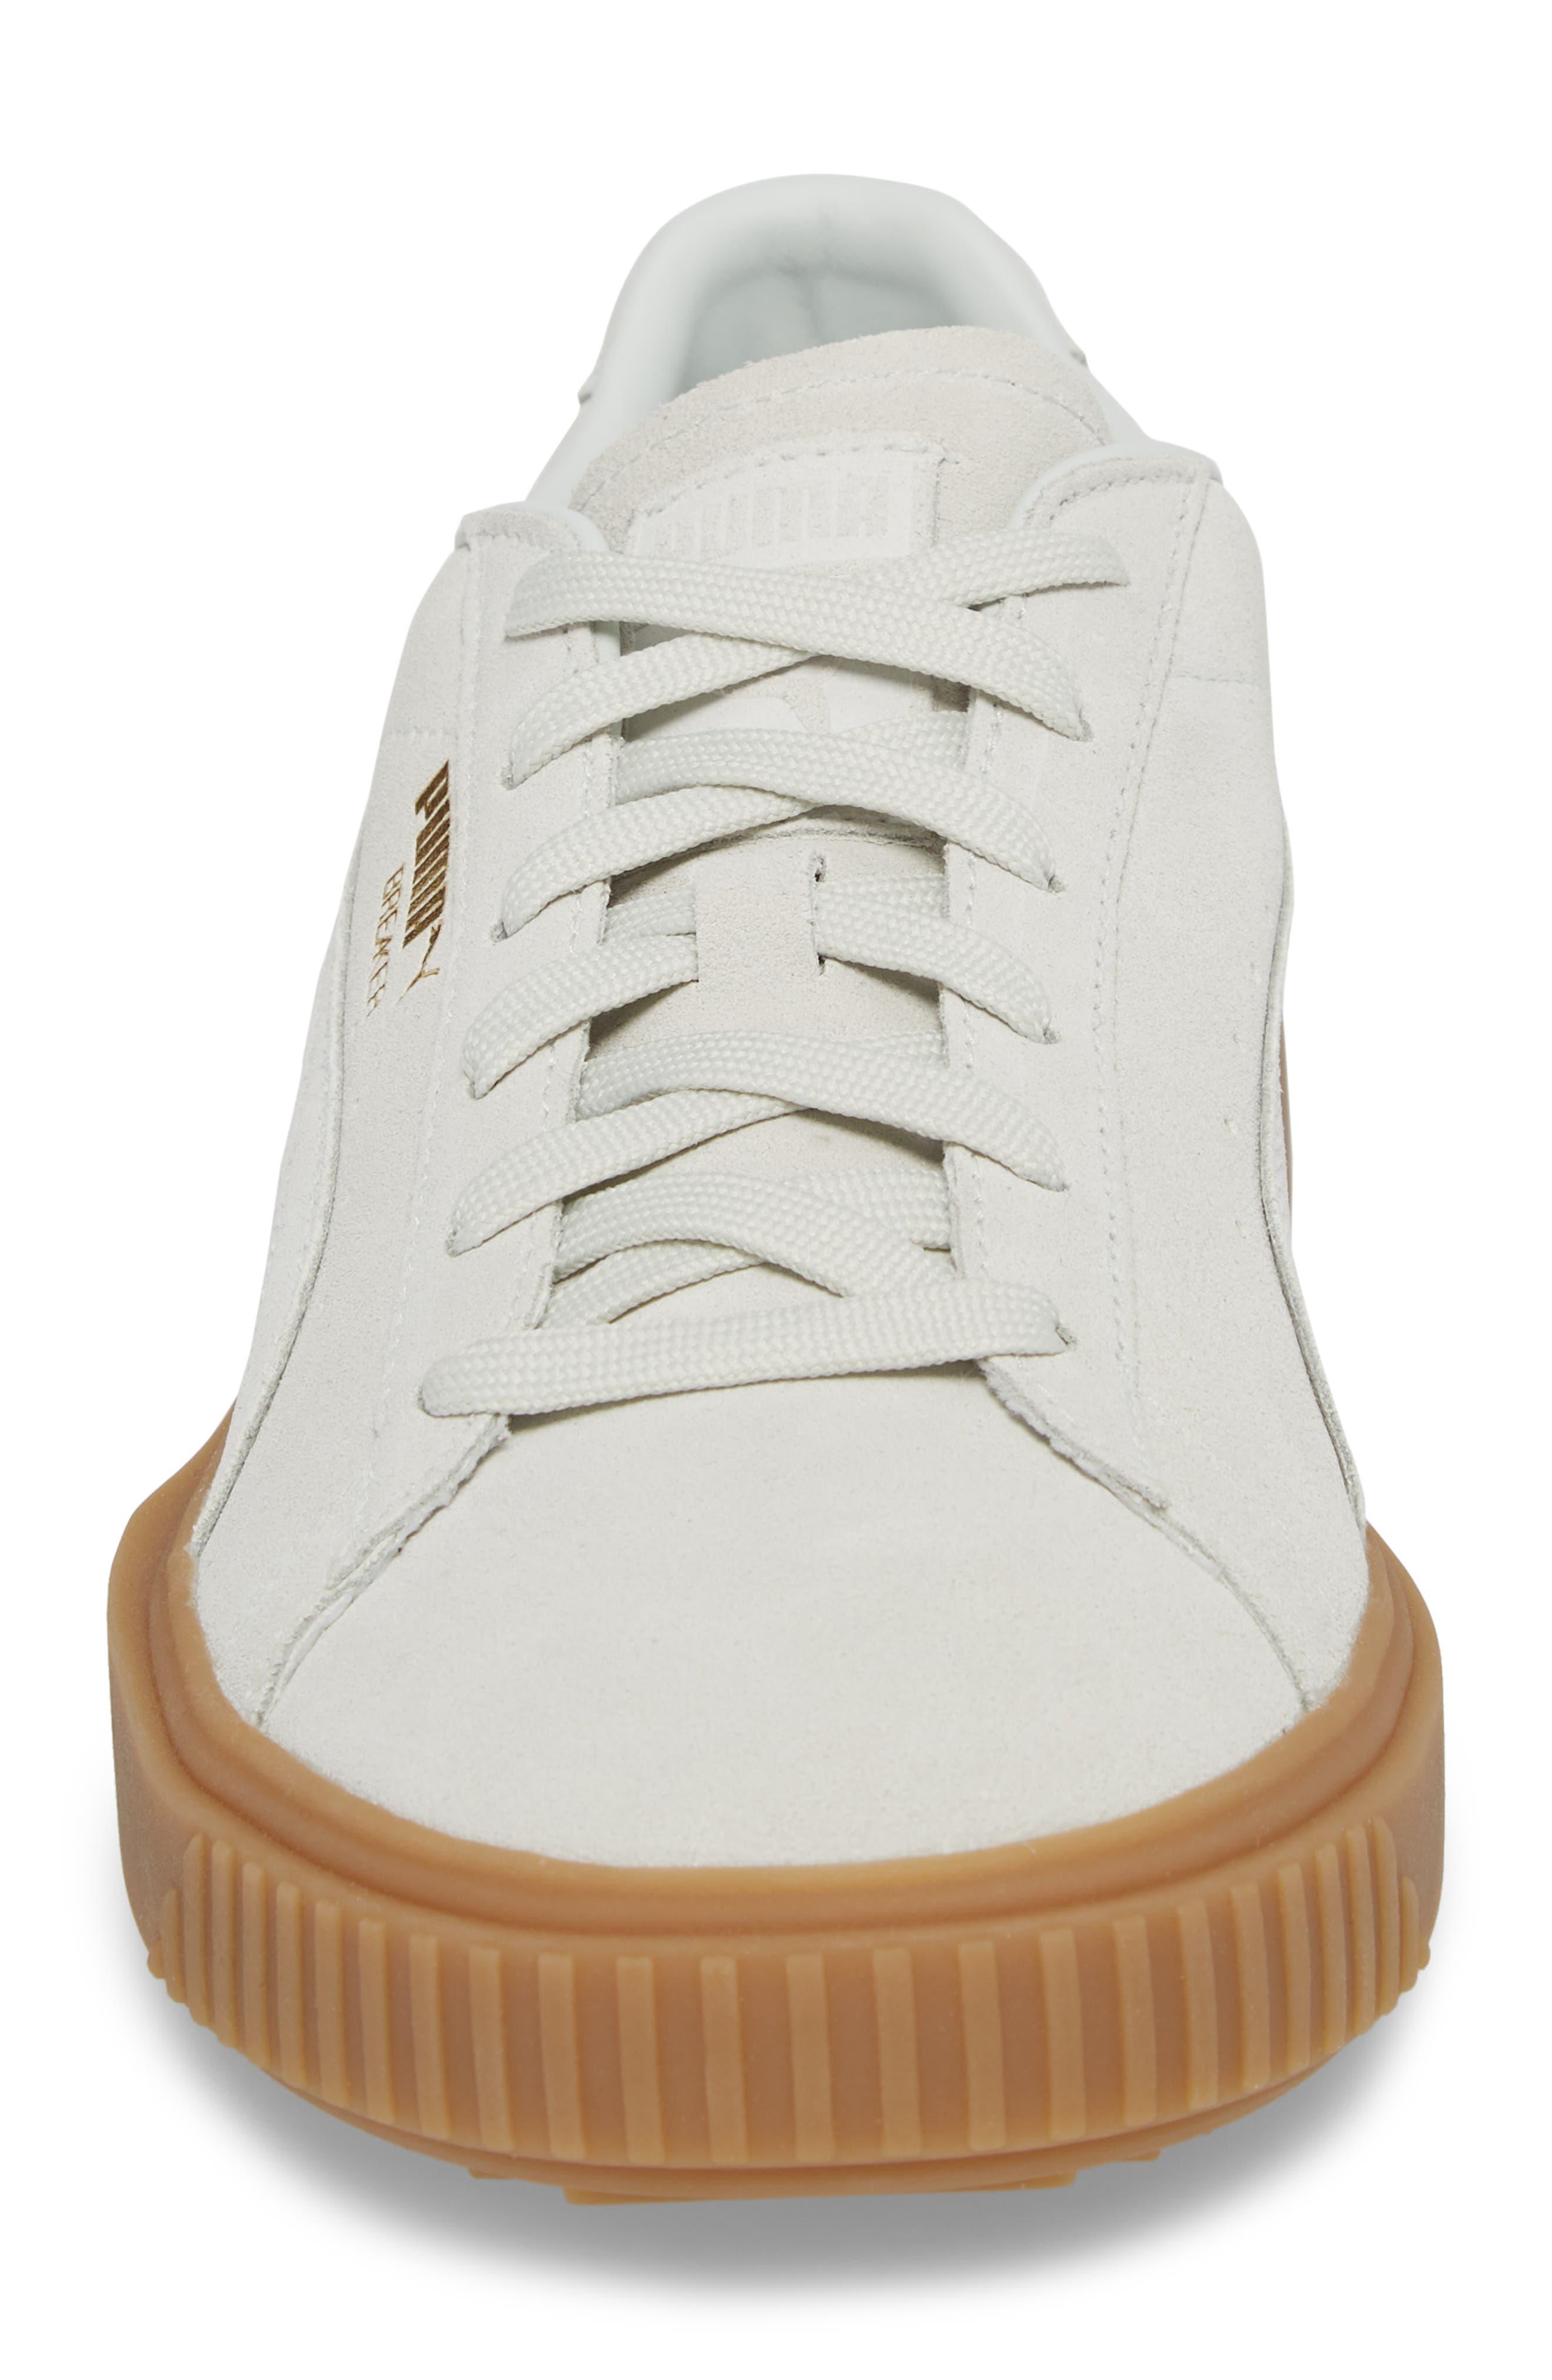 Breaker Suede Gum Low Top Sneaker,                             Alternate thumbnail 8, color,